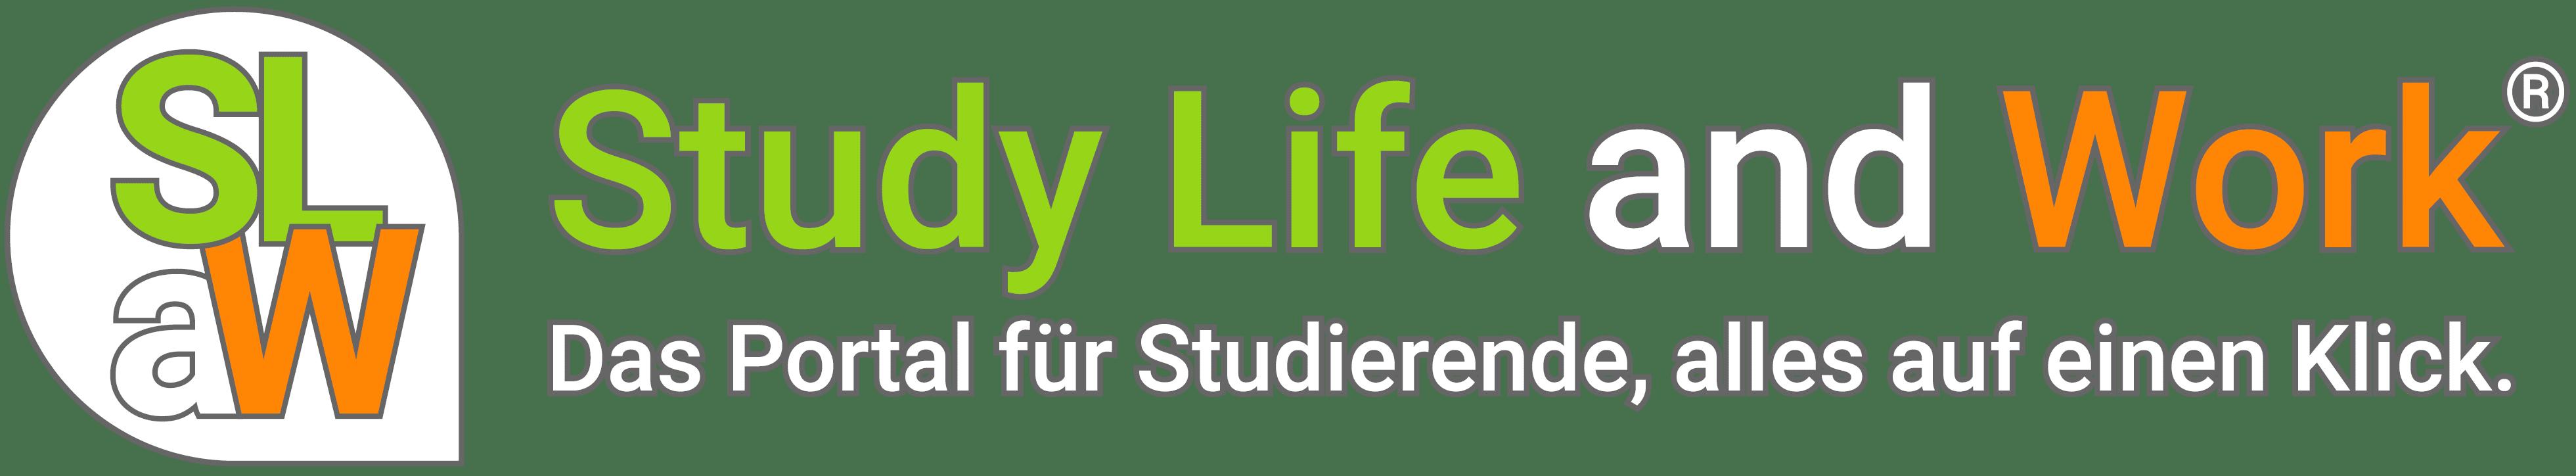 Offizielles Logo von Study, Life and Work